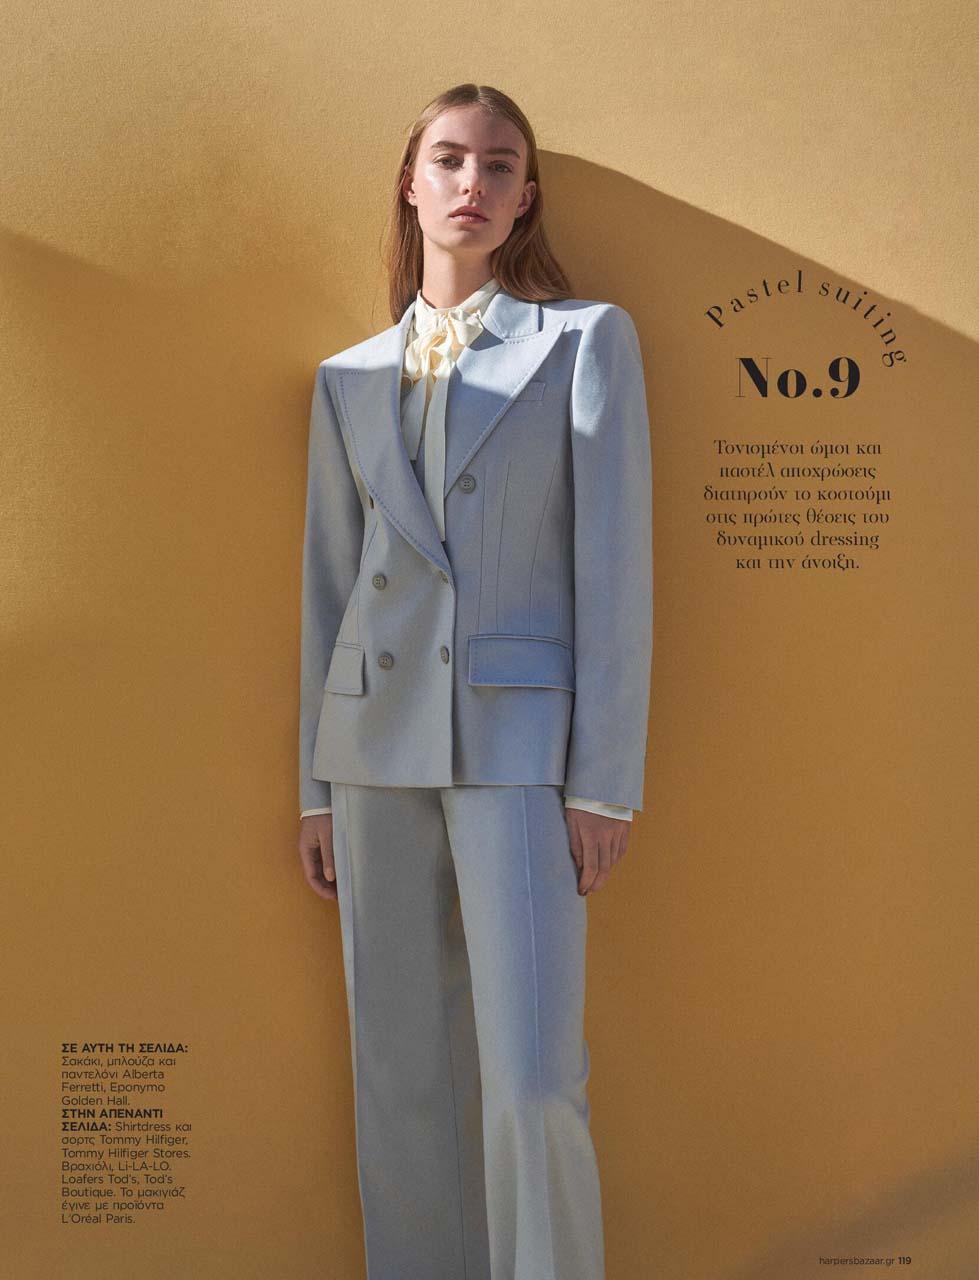 Clara Marie Arletta for Harper's Bazaar